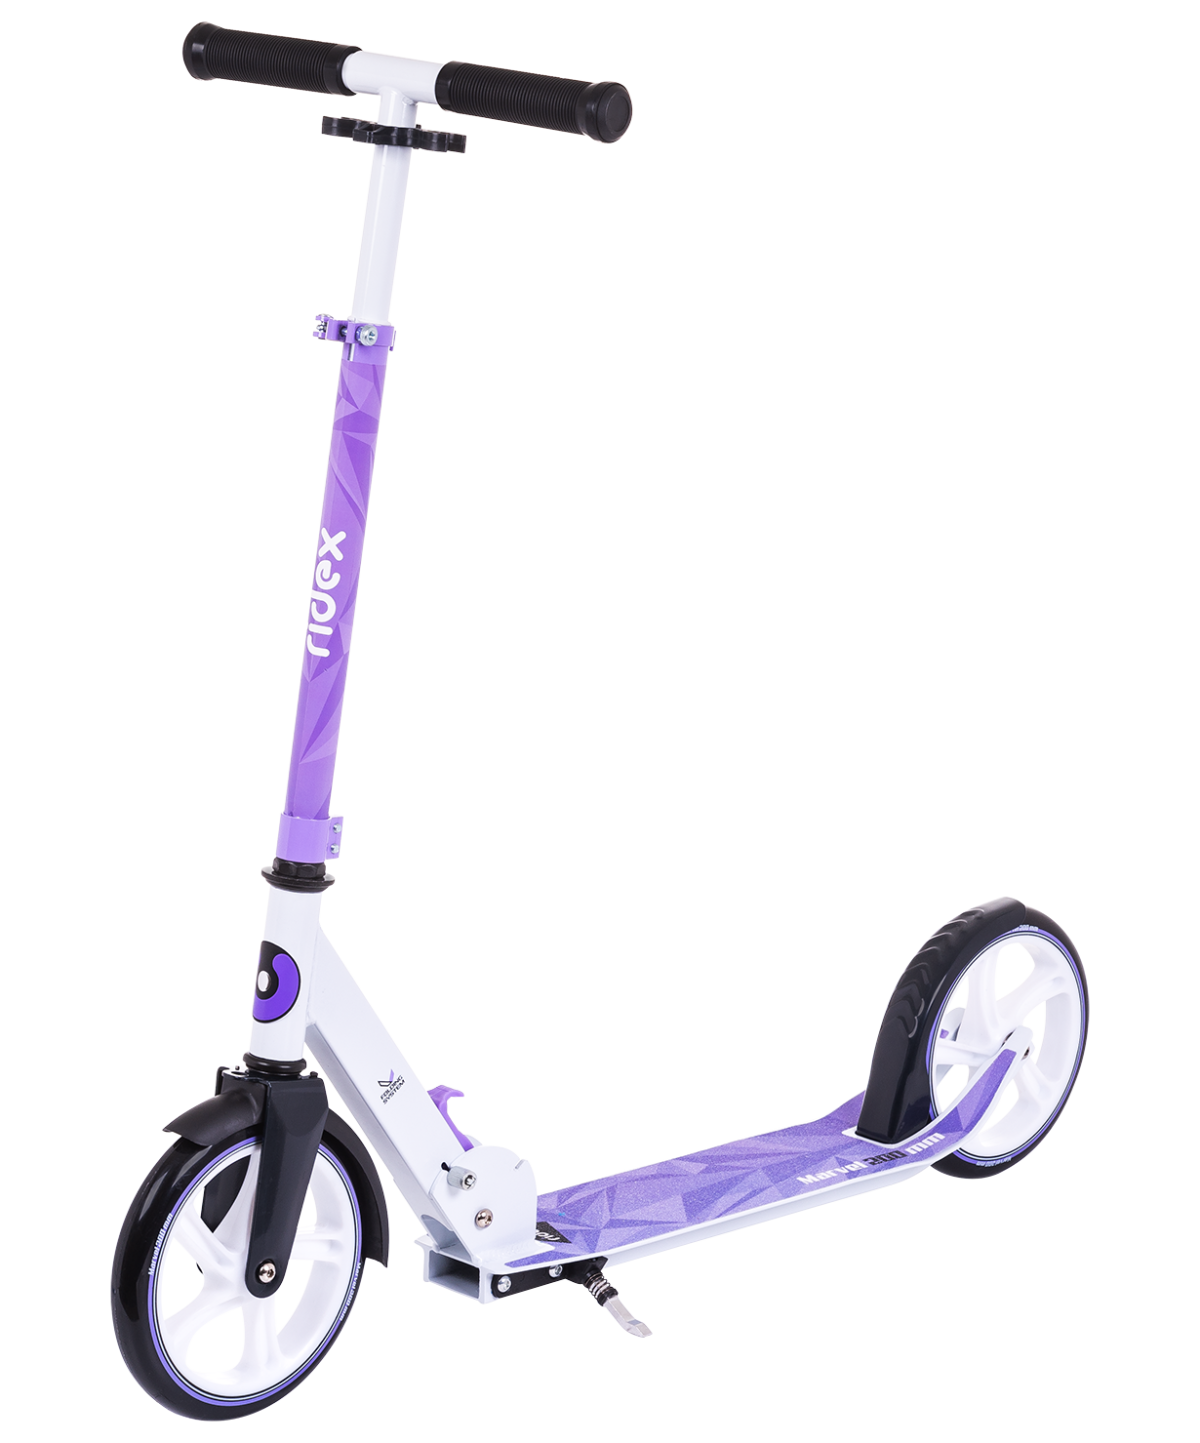 RIDEX Marvel самокат 2-х колесныйи 200 мм: фиолетовый/белый - 1